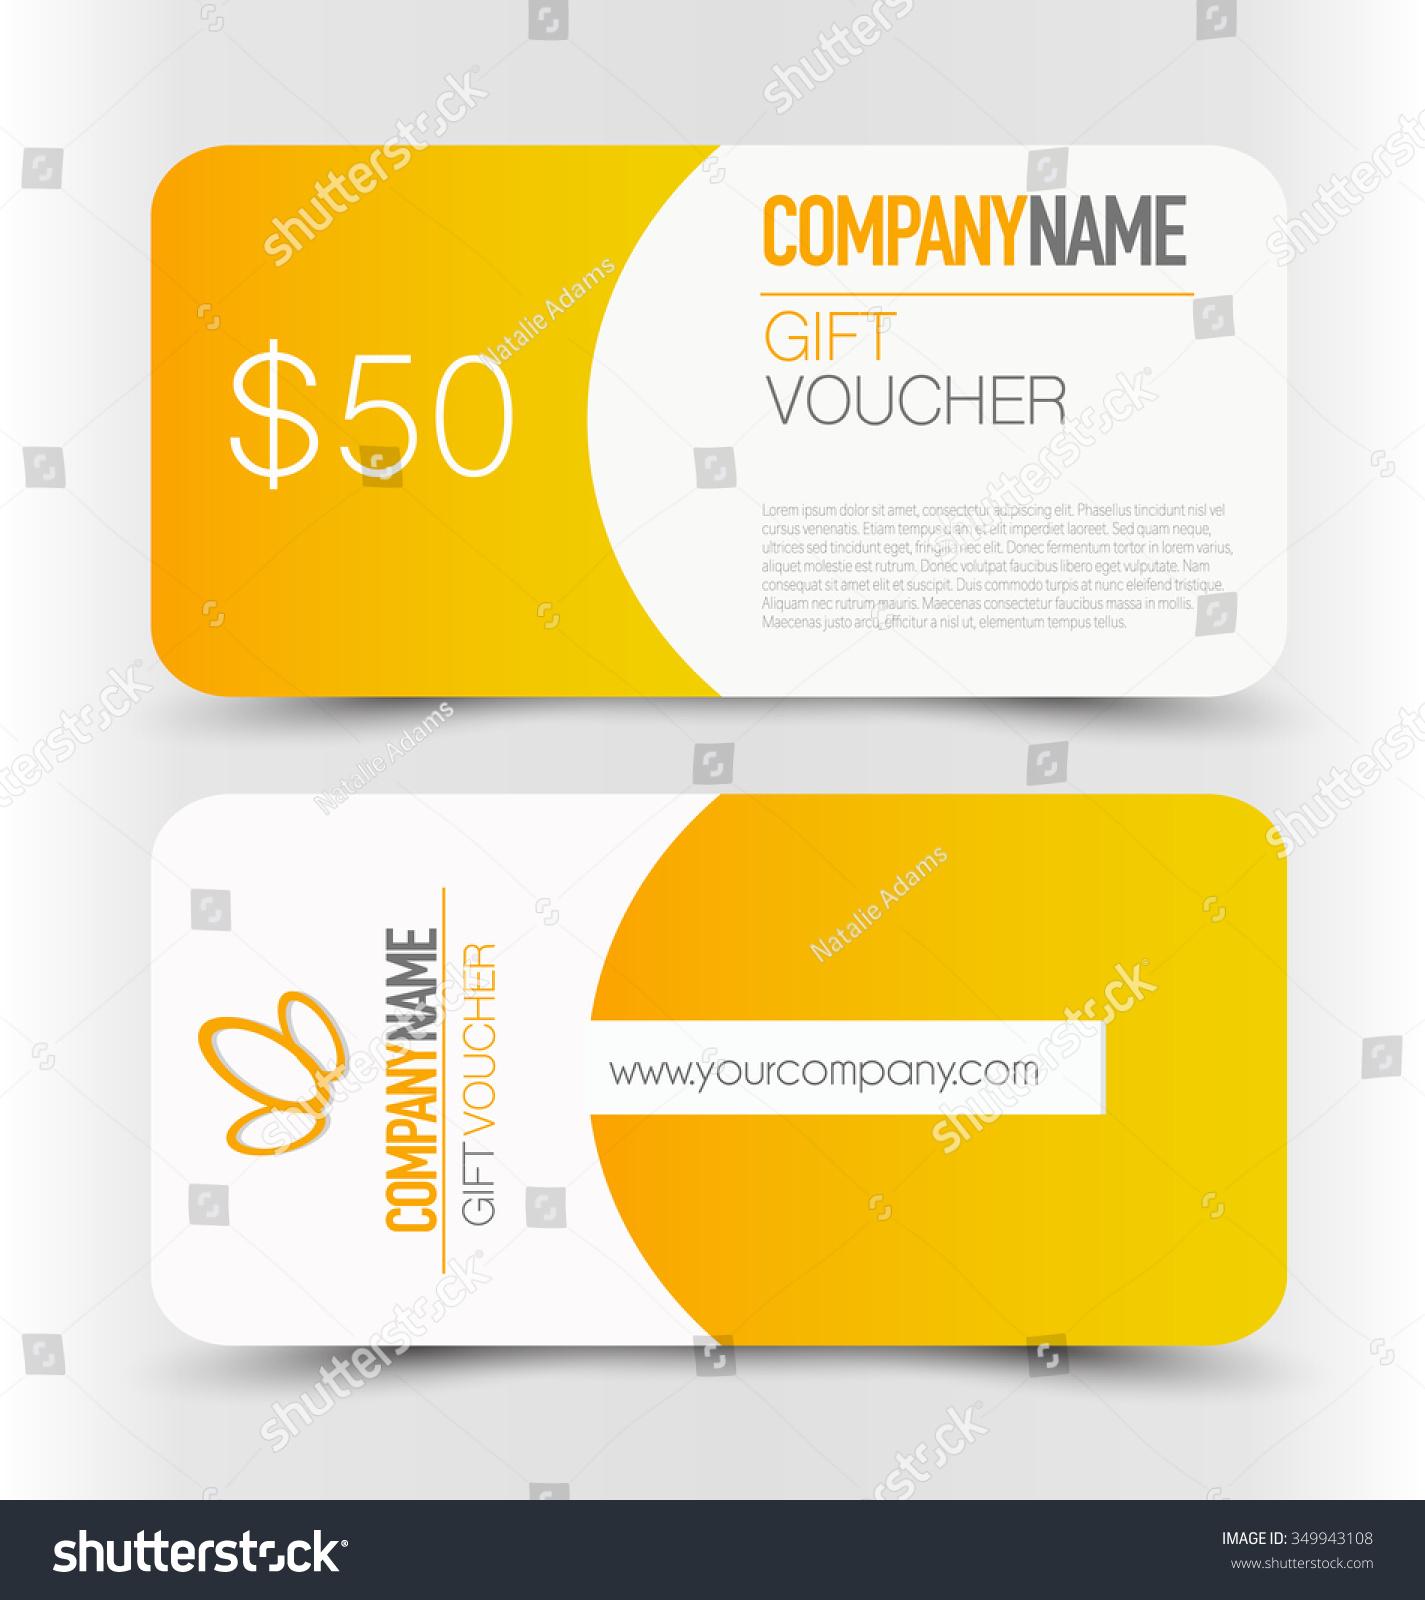 Gift Card Voucher Business Banner Template Stock Vector 349943108 ...